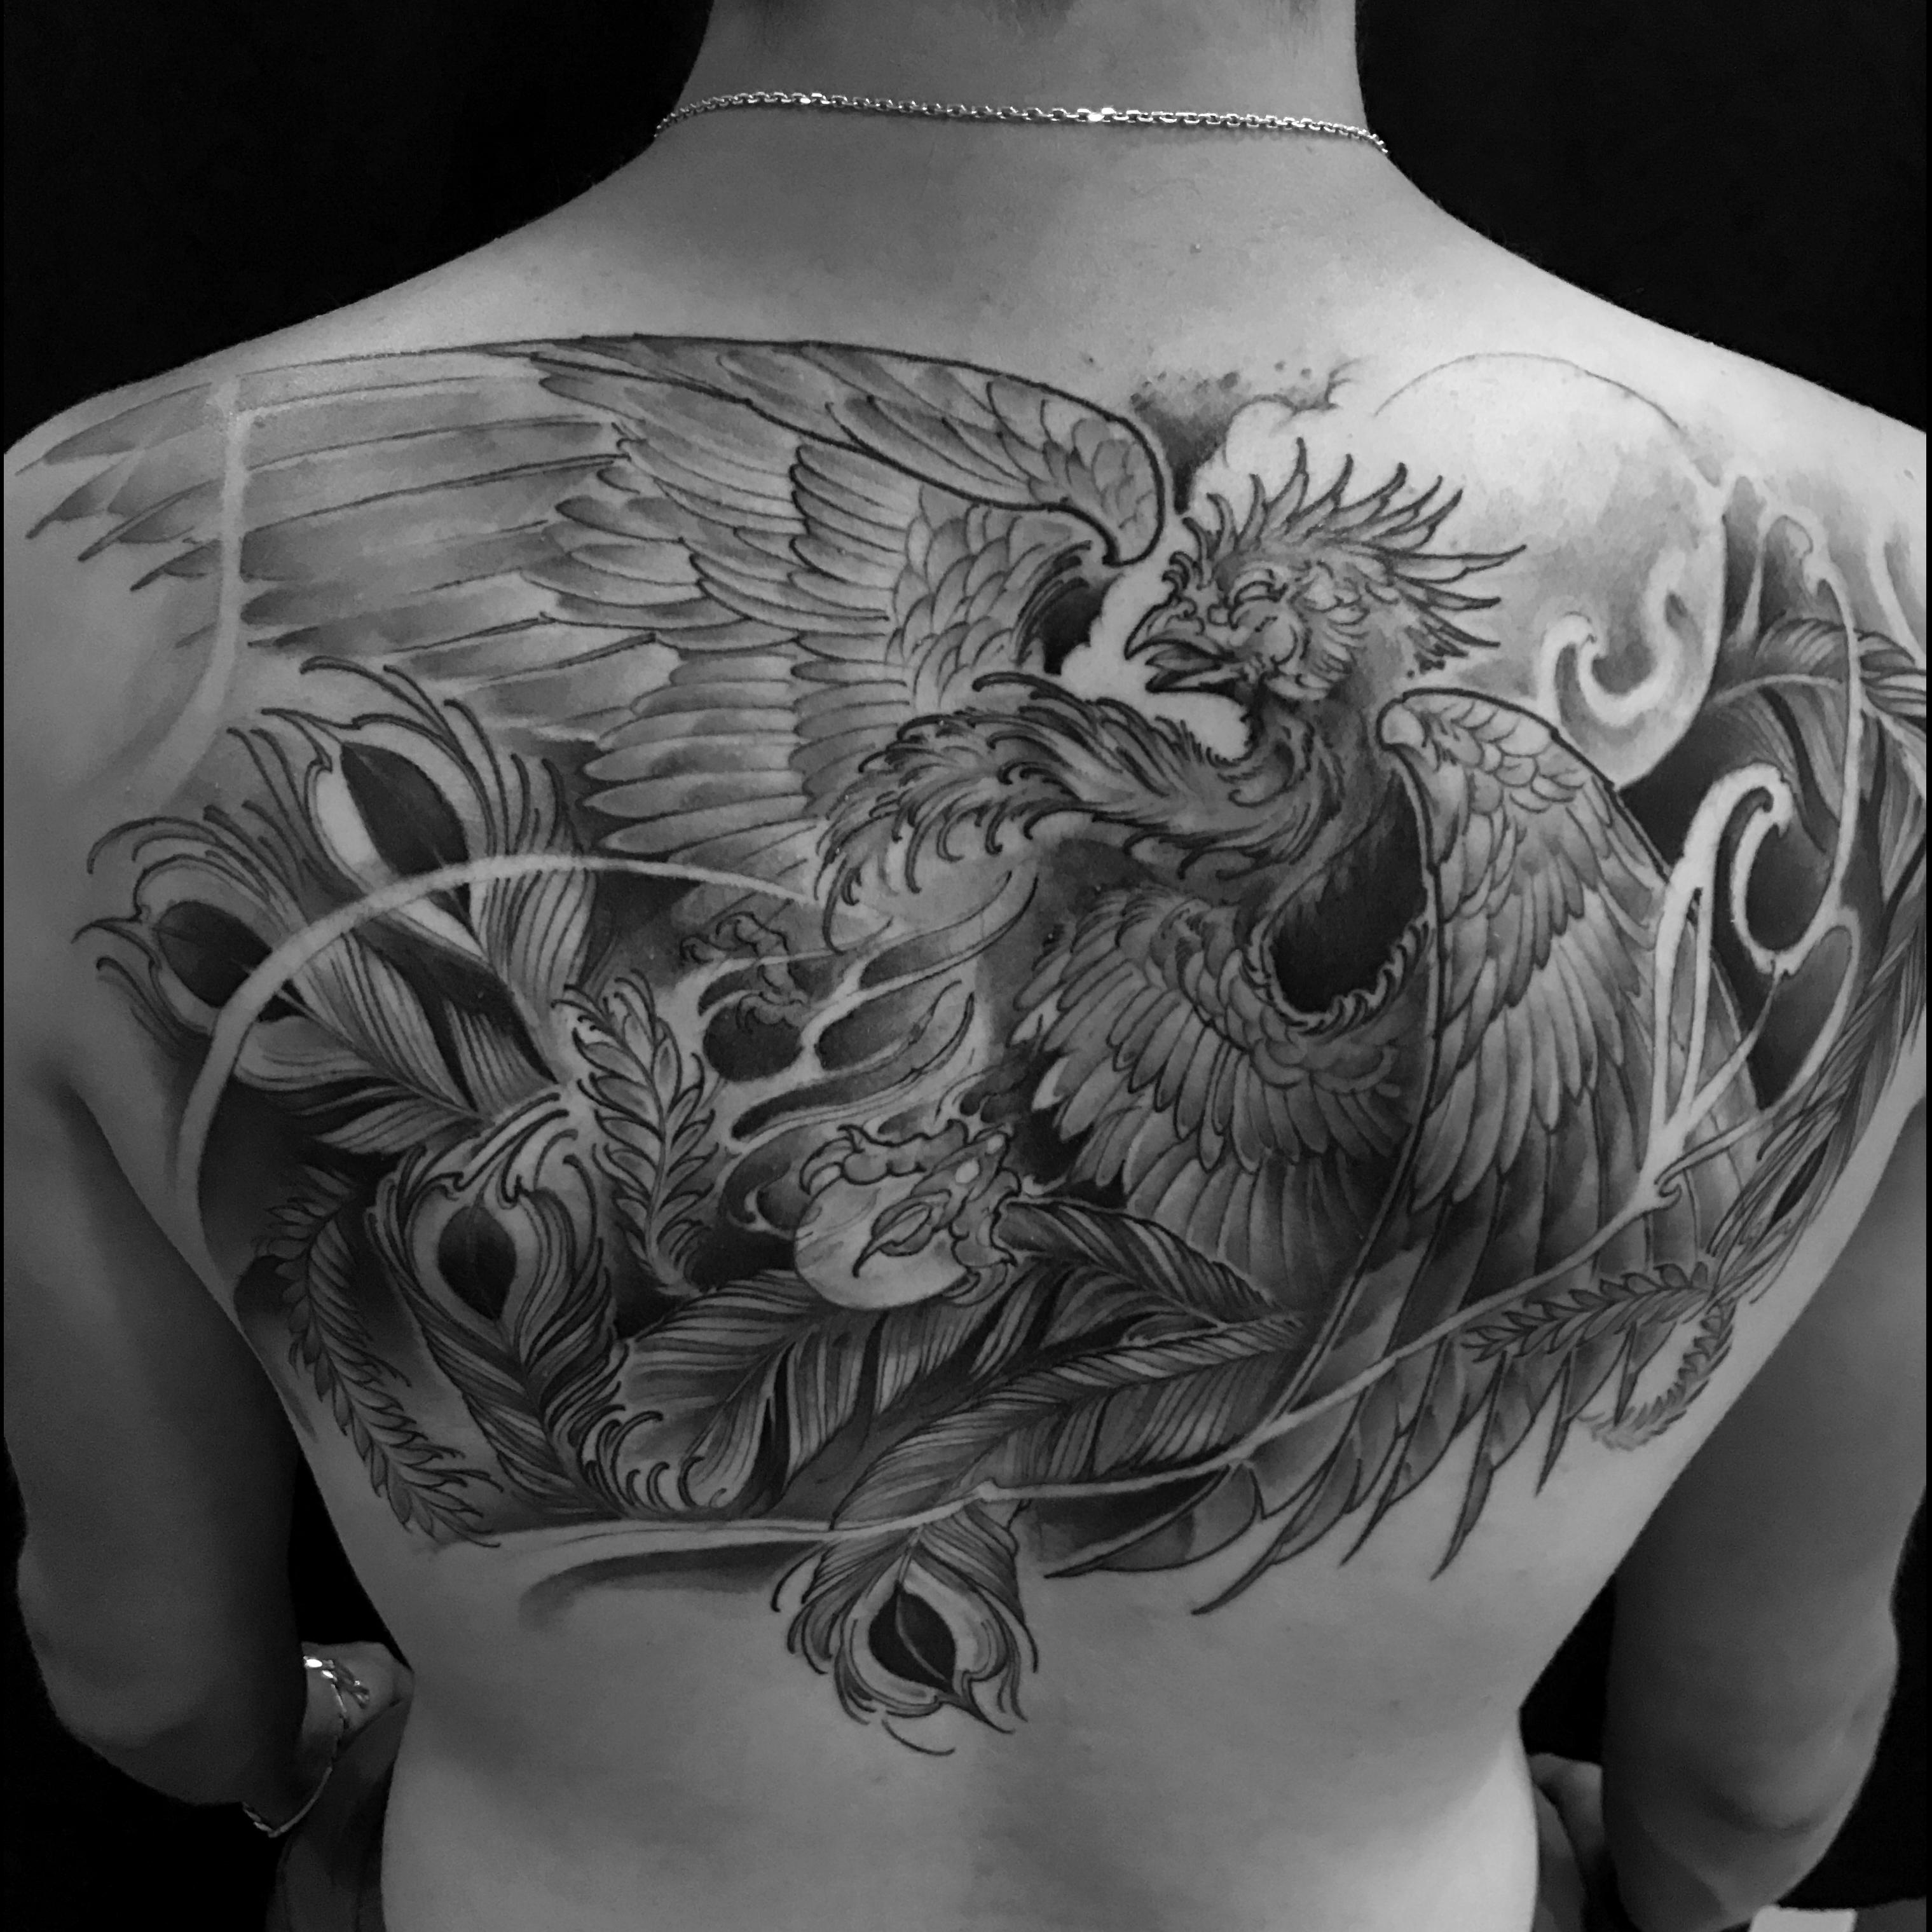 Tatouage Oreille Femme concernant kahuna studio - tatouage & piercing